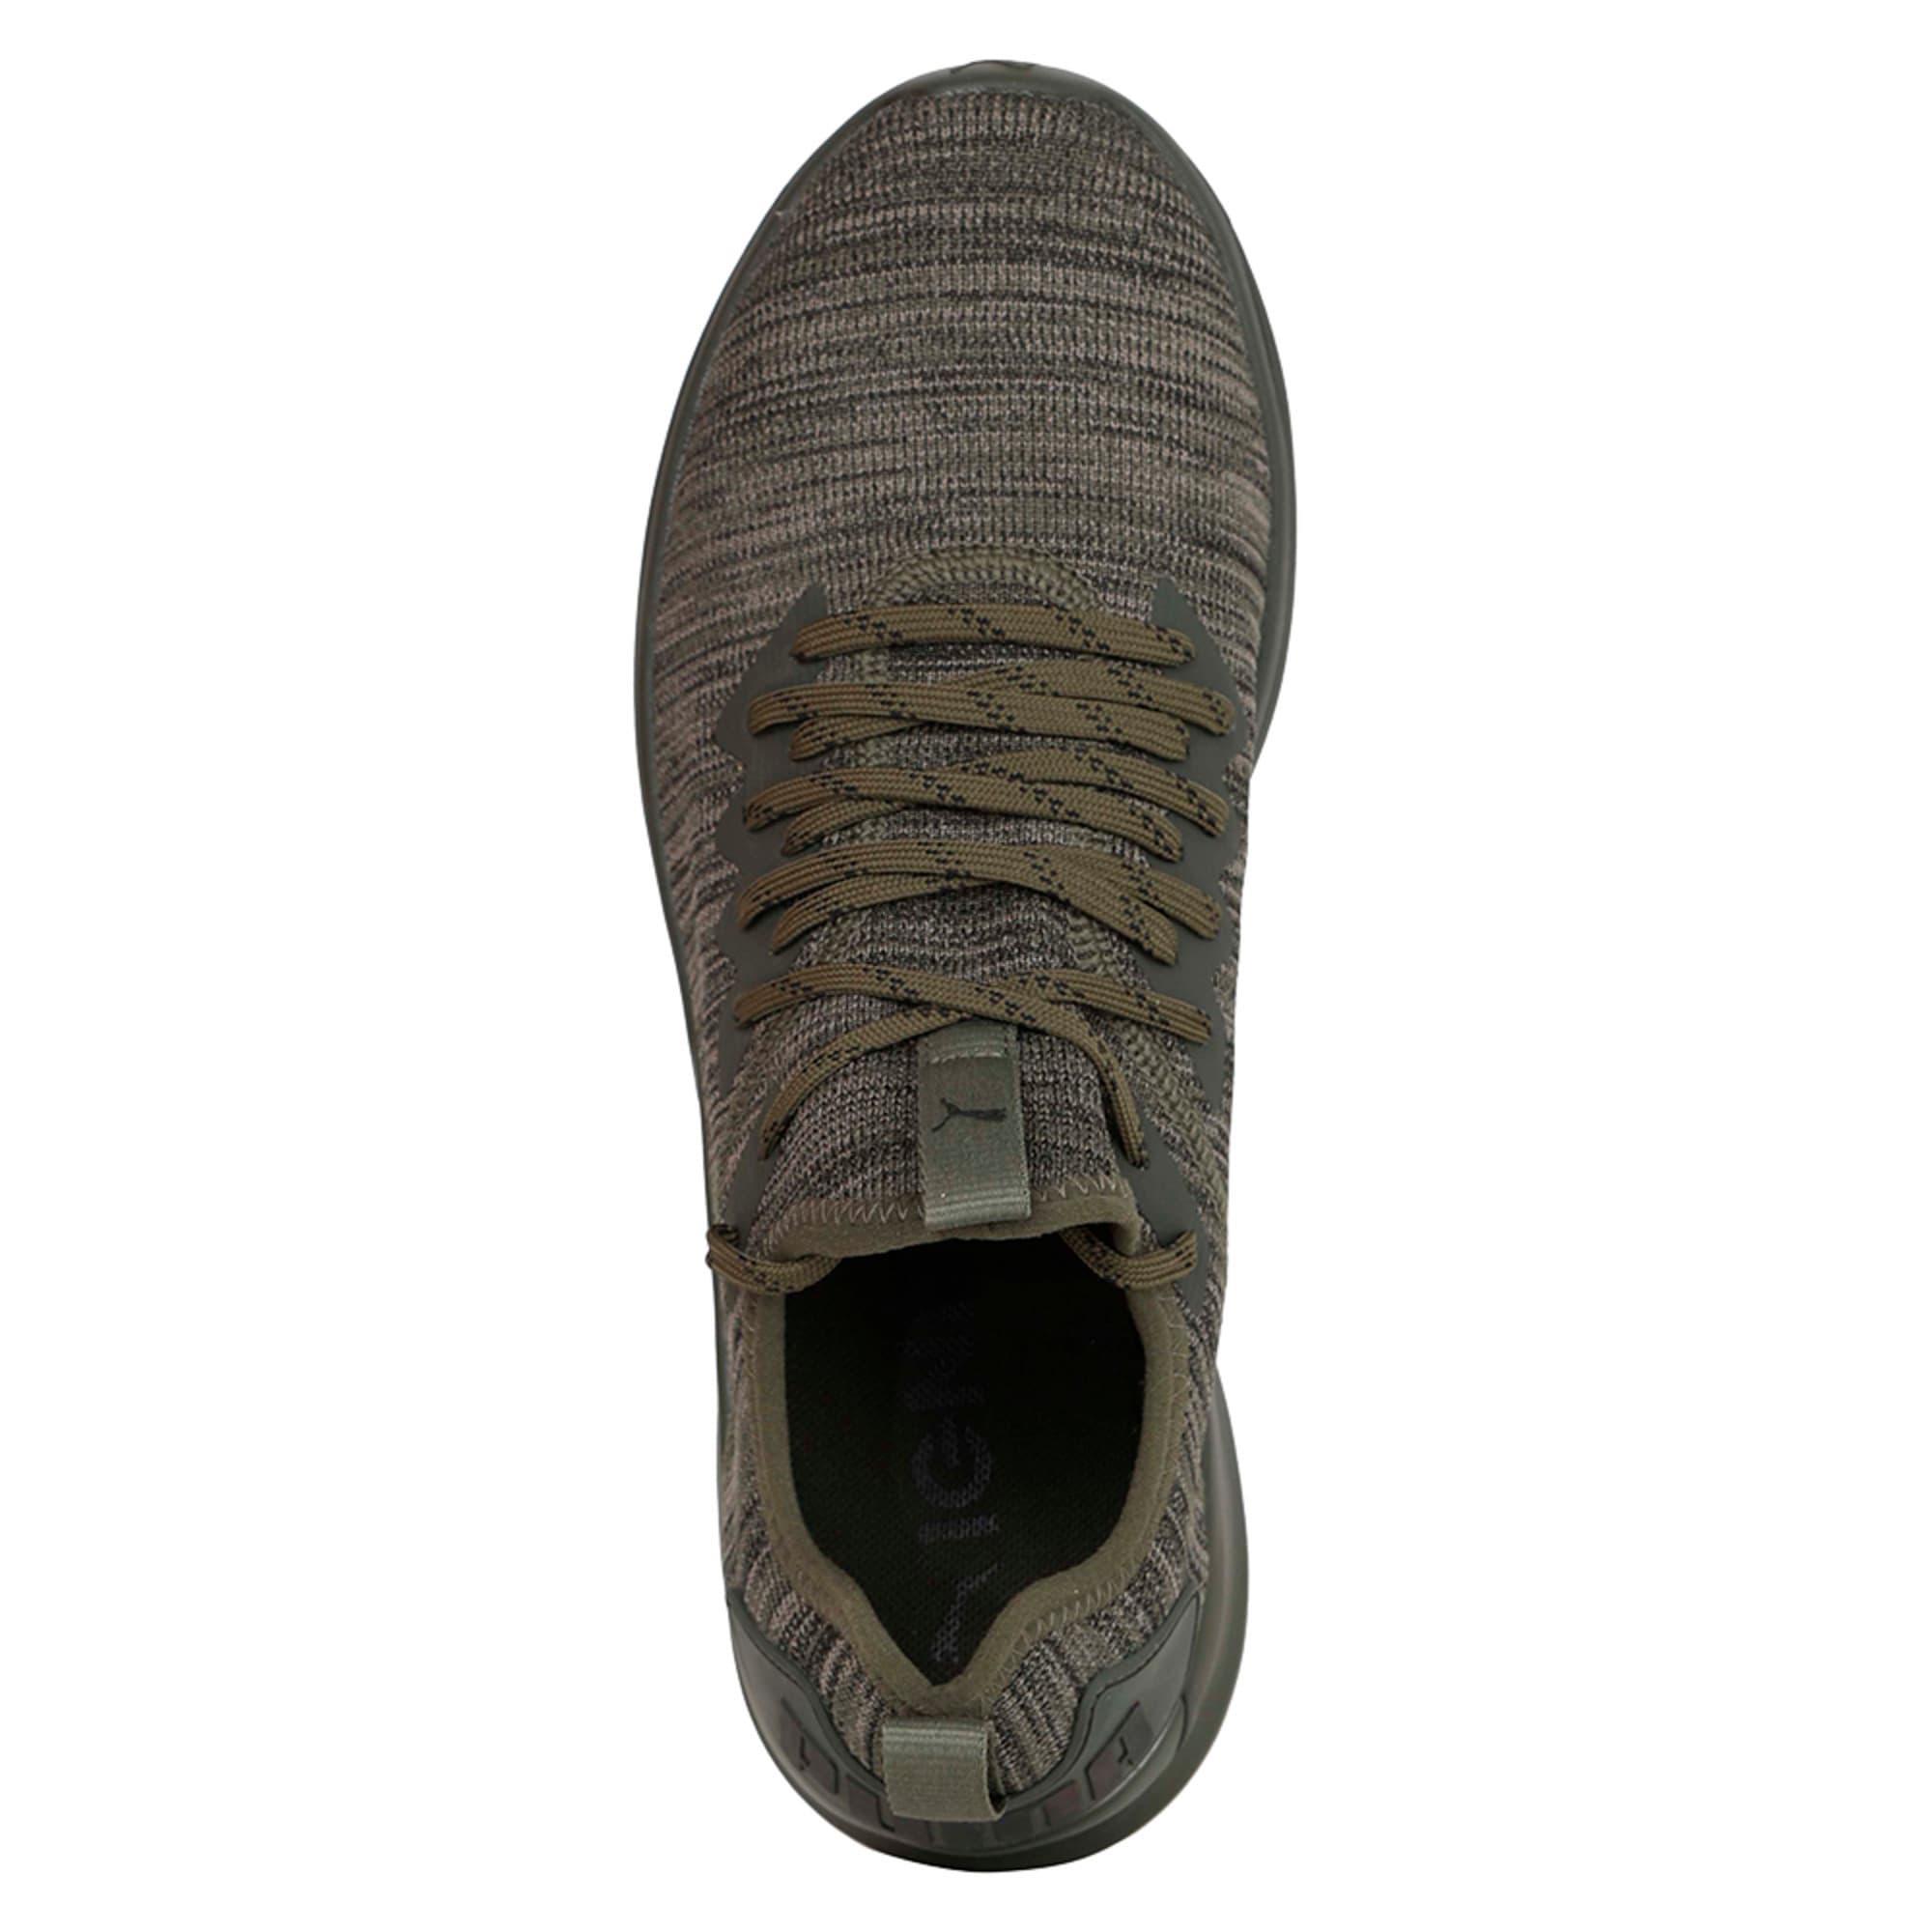 Thumbnail 4 of IGNITE Flash evoKNIT Men's Training Shoes, Forest Night-Gray-Black, medium-IND